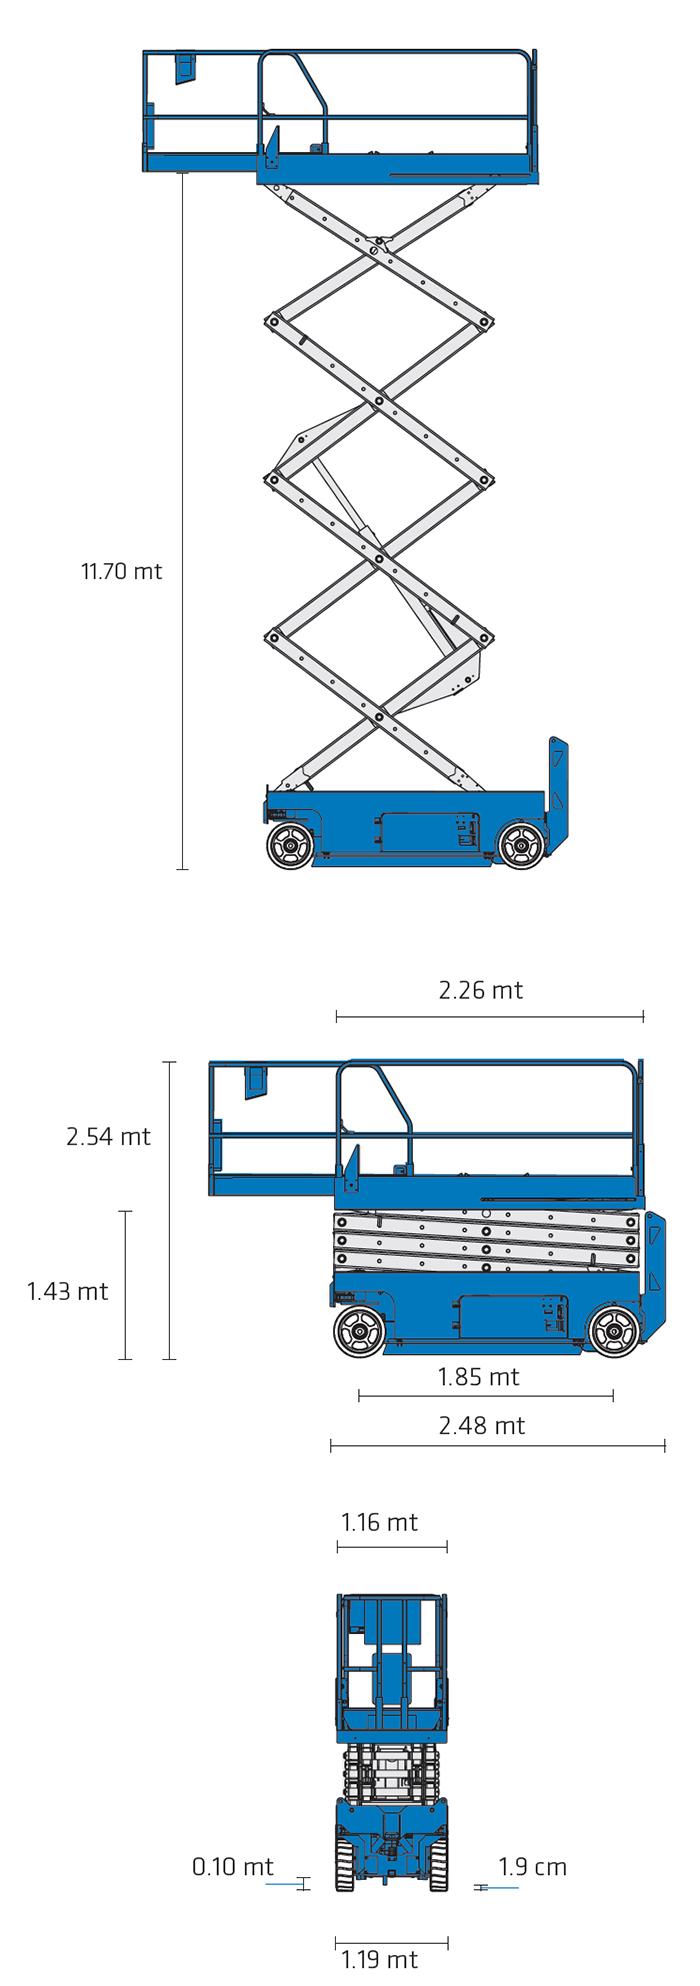 Piattaforma Semovente Verticale Elettrica VE 14 GE - GS 4047